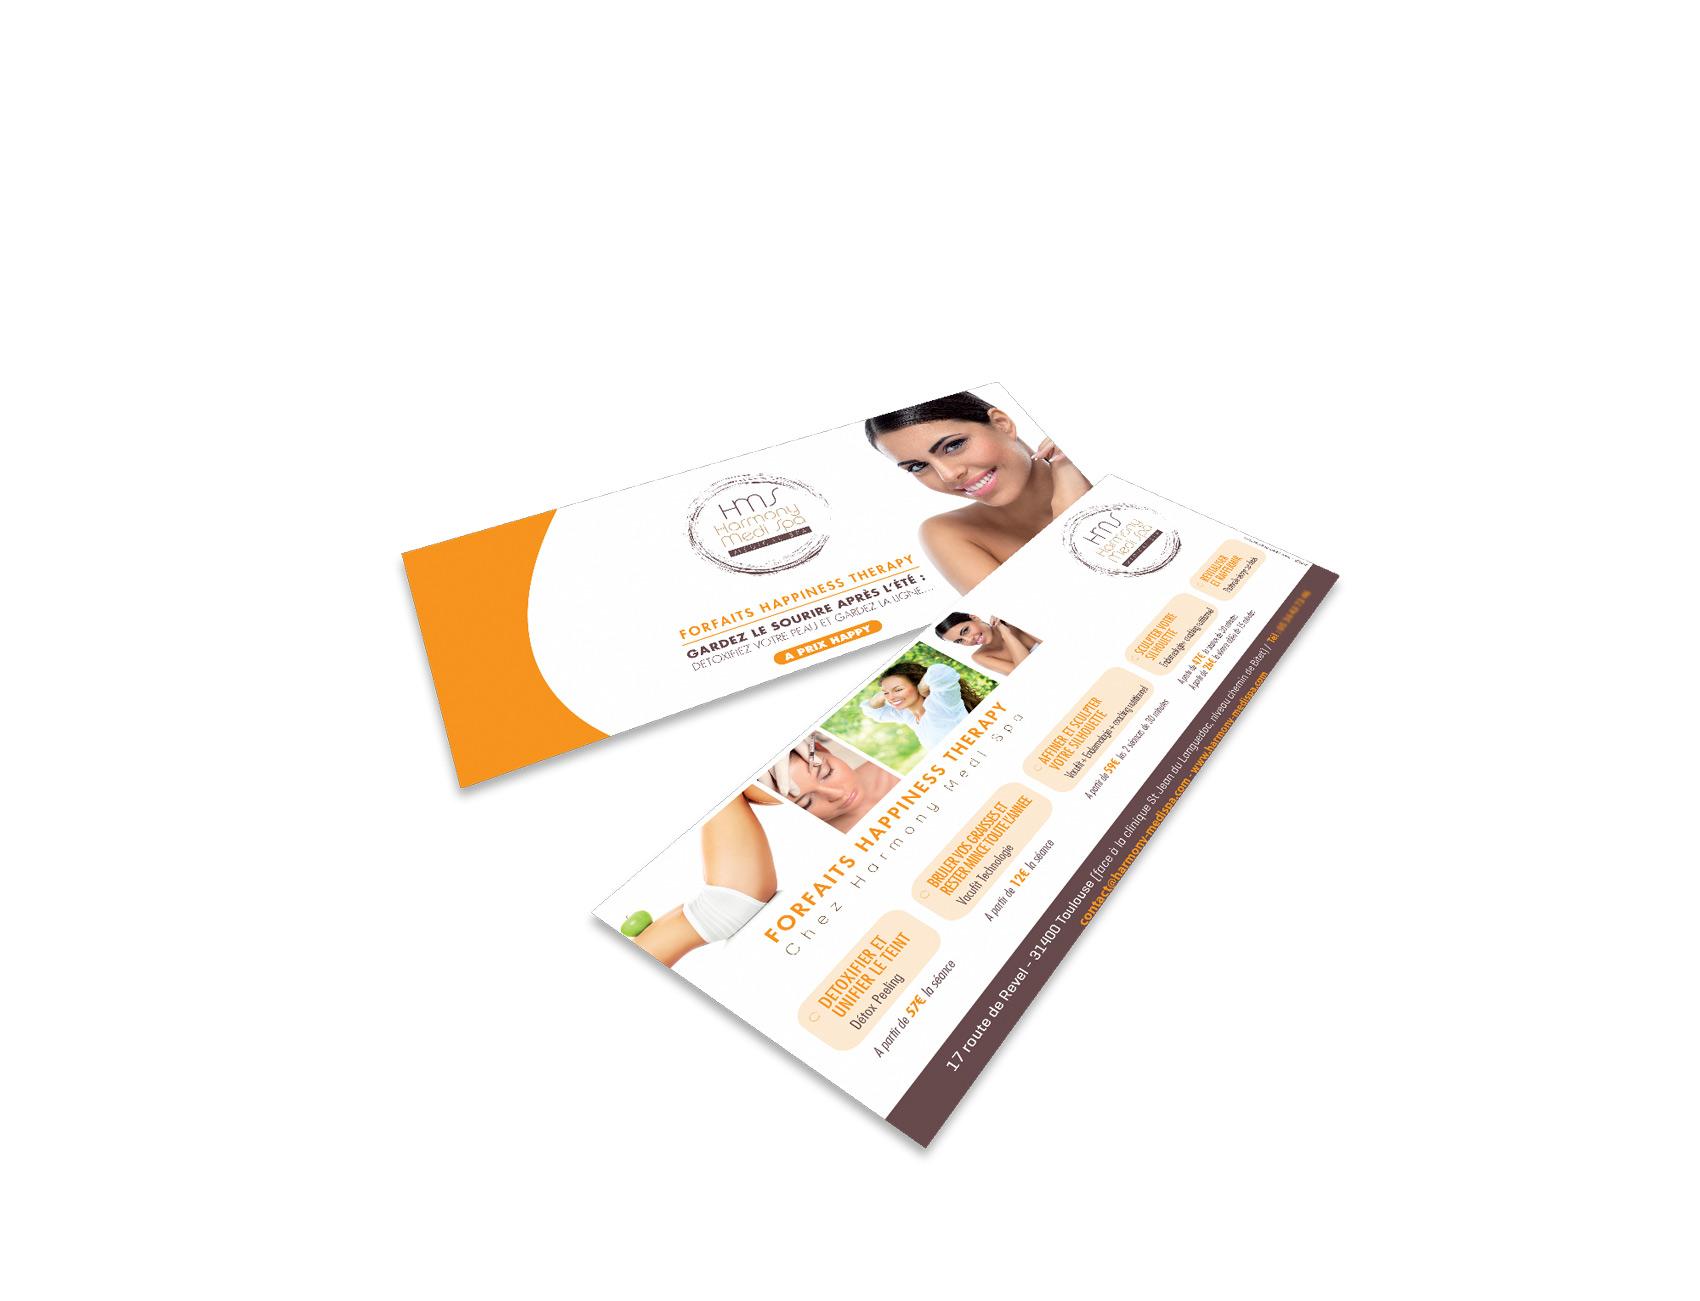 flyer-1-harmony-medi-spa-agence-sante-karma-communication-nice-paris